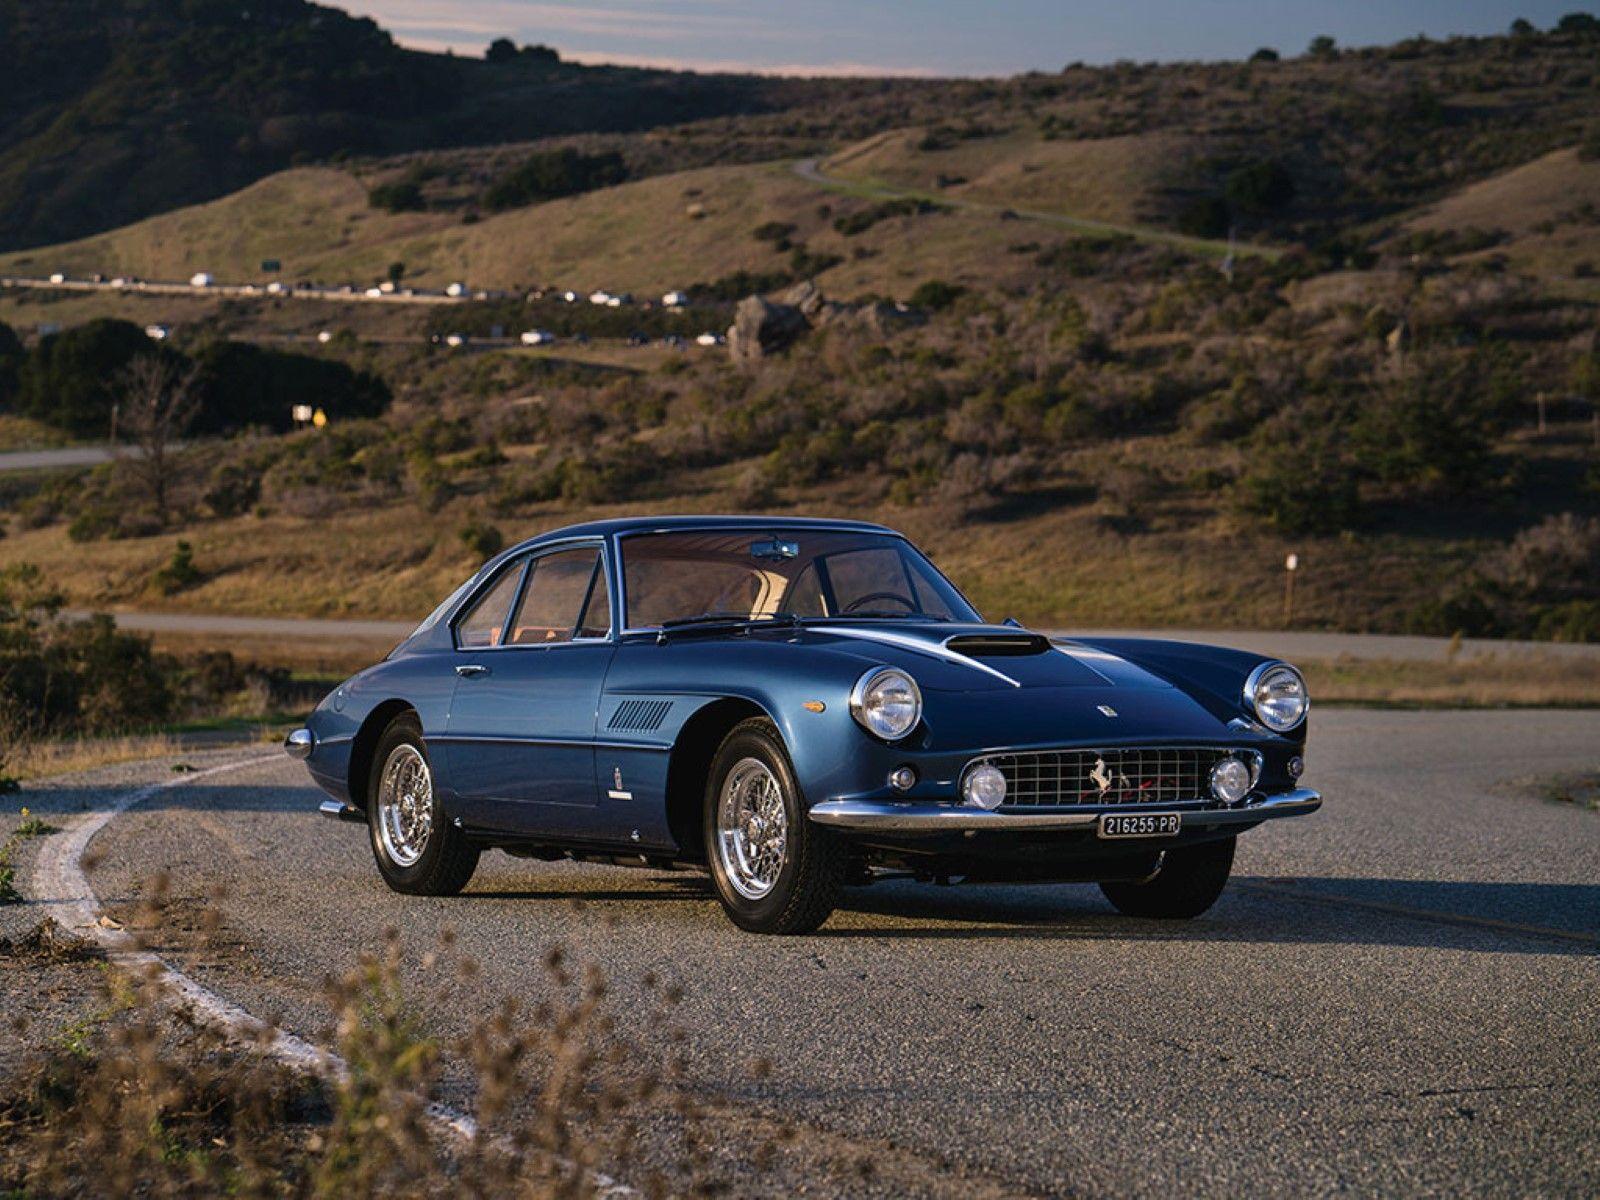 Ferrari-400-Superamerica-SWB-pininfarina-001.jpg